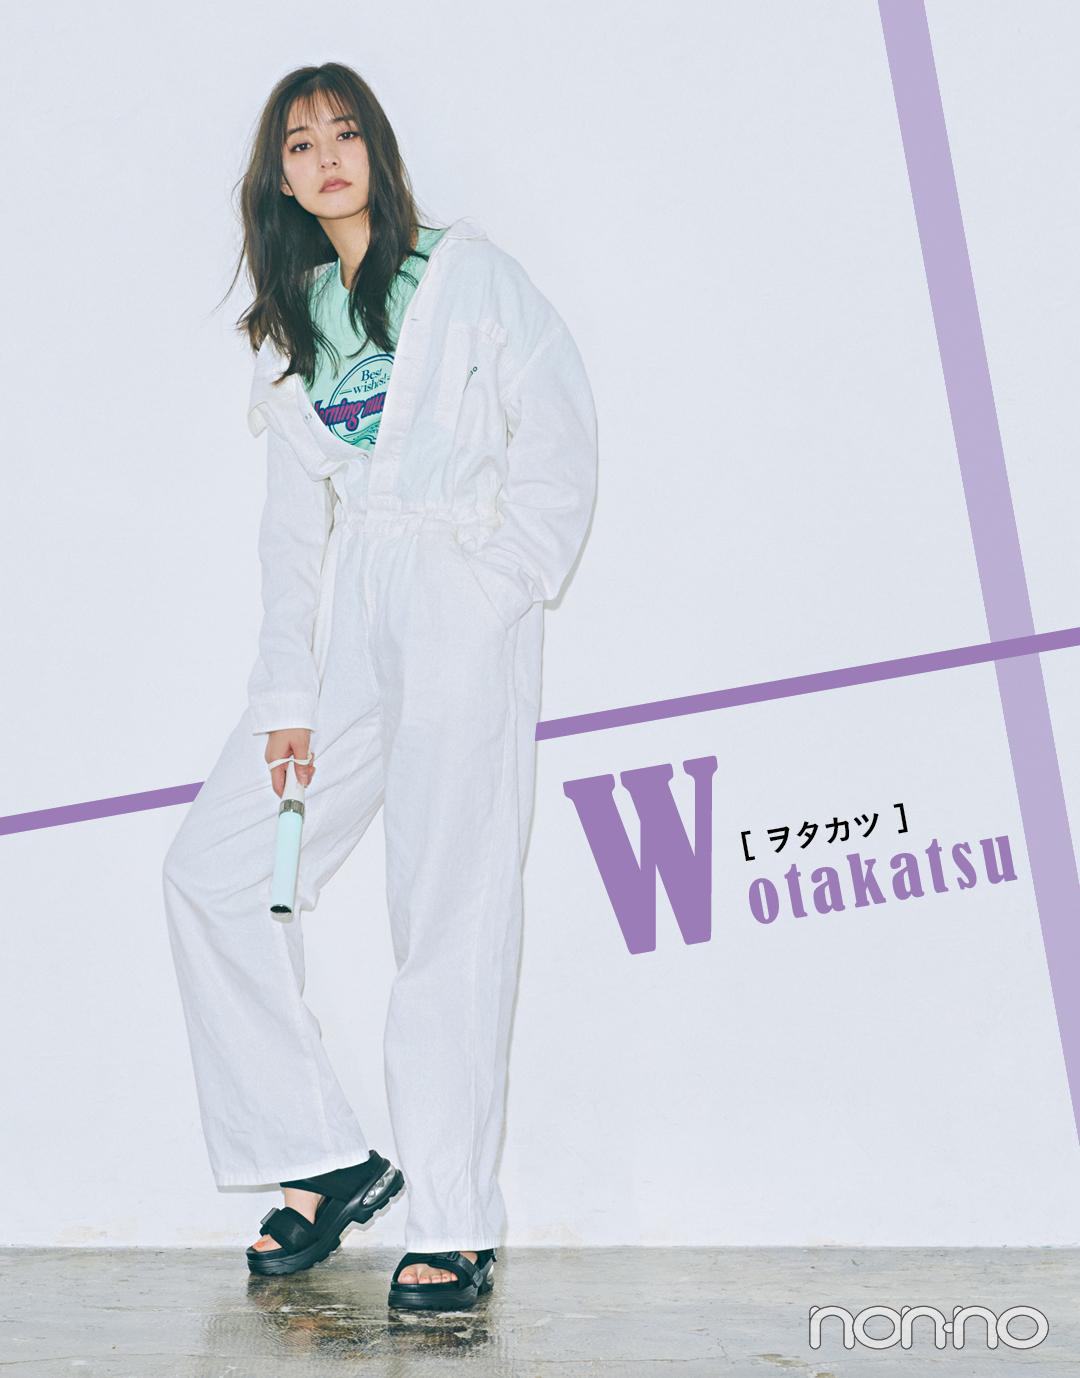 Wotakatsu